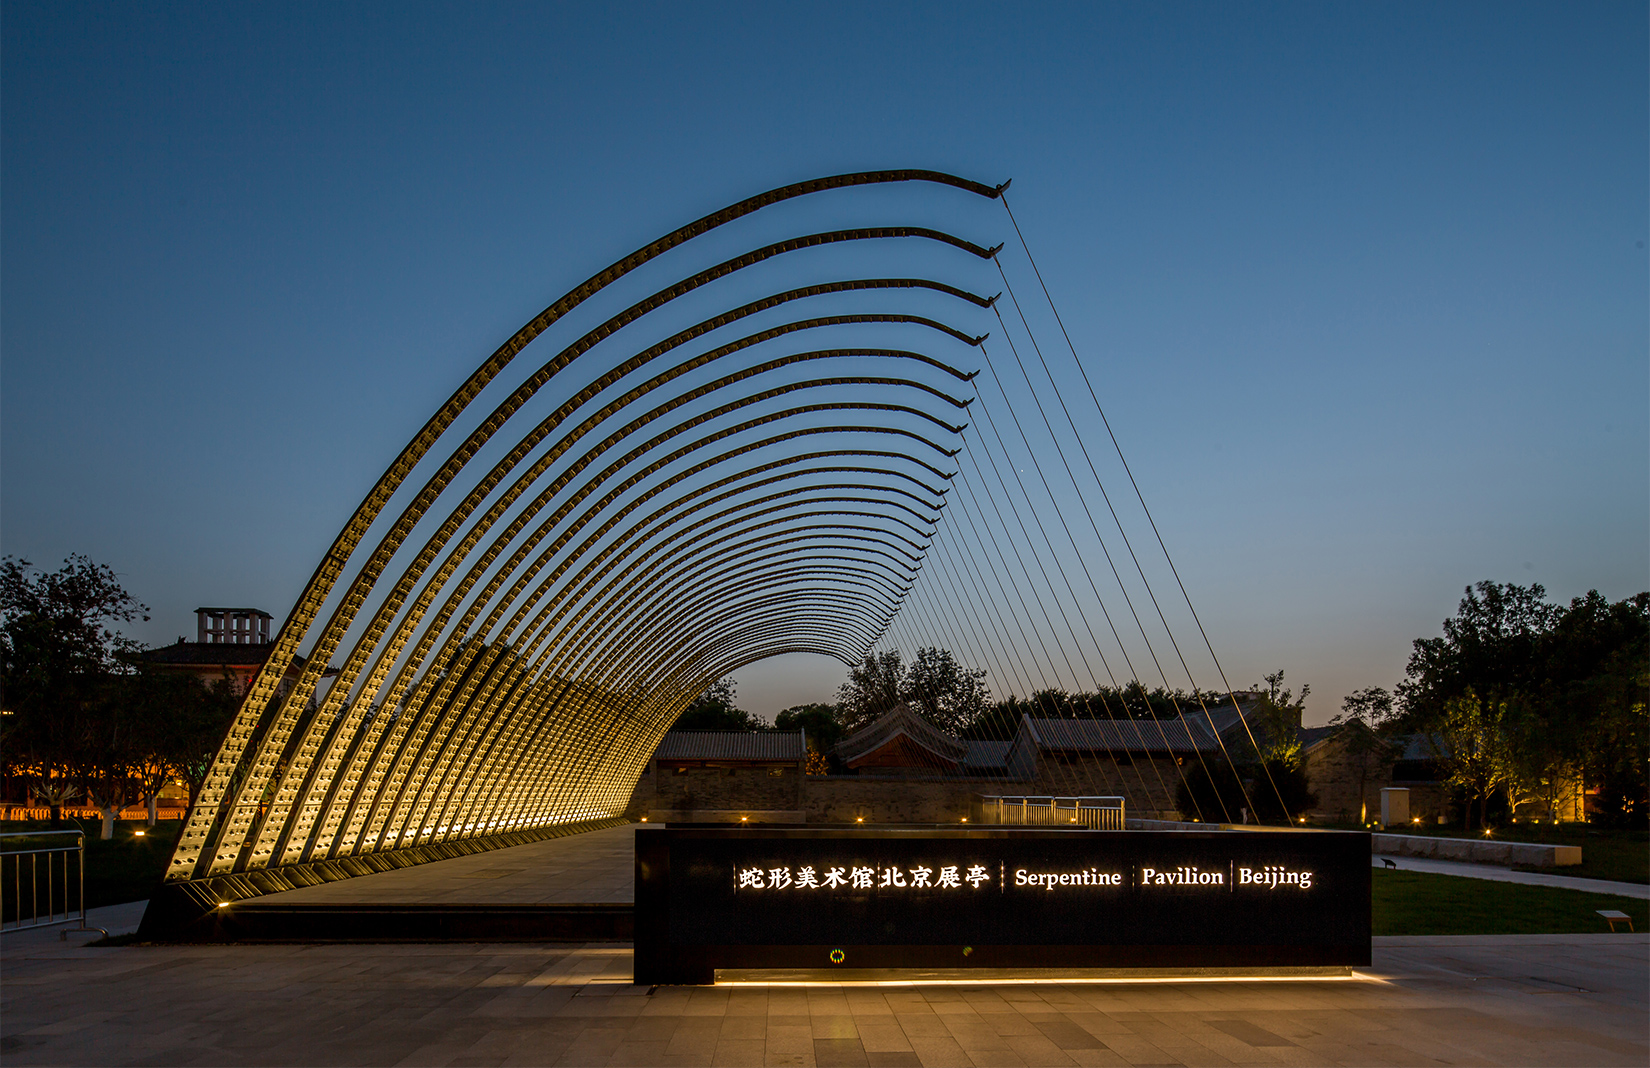 Serpentine-Pavilion-Beijing-ben_0550-homepage